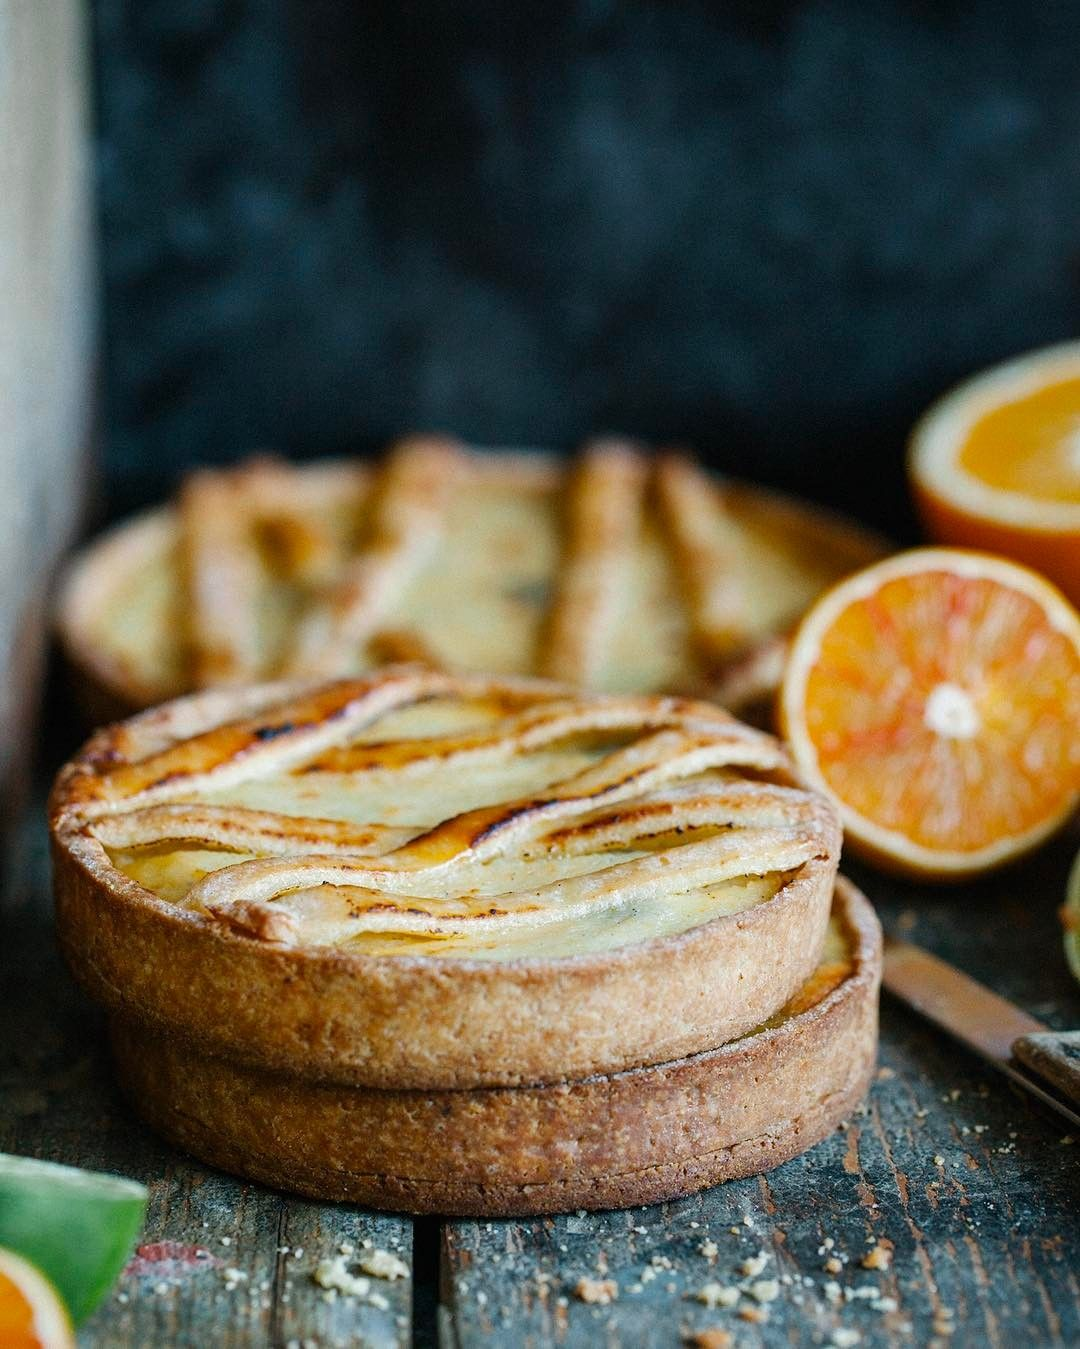 """Mi piace"": 2,997, commenti: 68 - Maja & Jernej (@jernejkitchen) su Instagram: ""Ricotta + orange + dark chocolate + homemade tart shells = irresistible dessert. 😋We adore citrus…"""